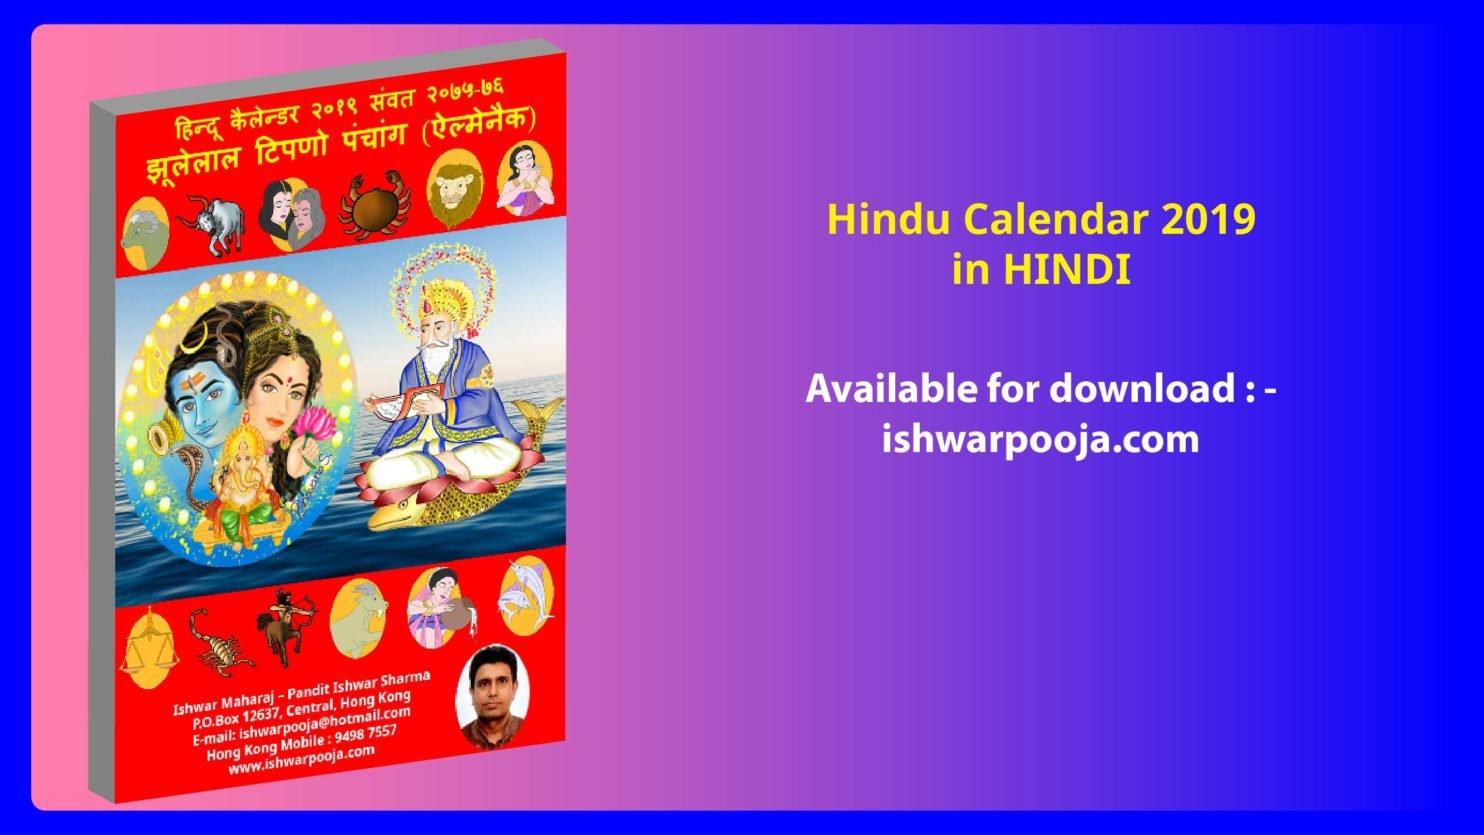 Hindu Calendar 2019 In Hindi – Ishwar Maharaj U Of R Calendar 2019